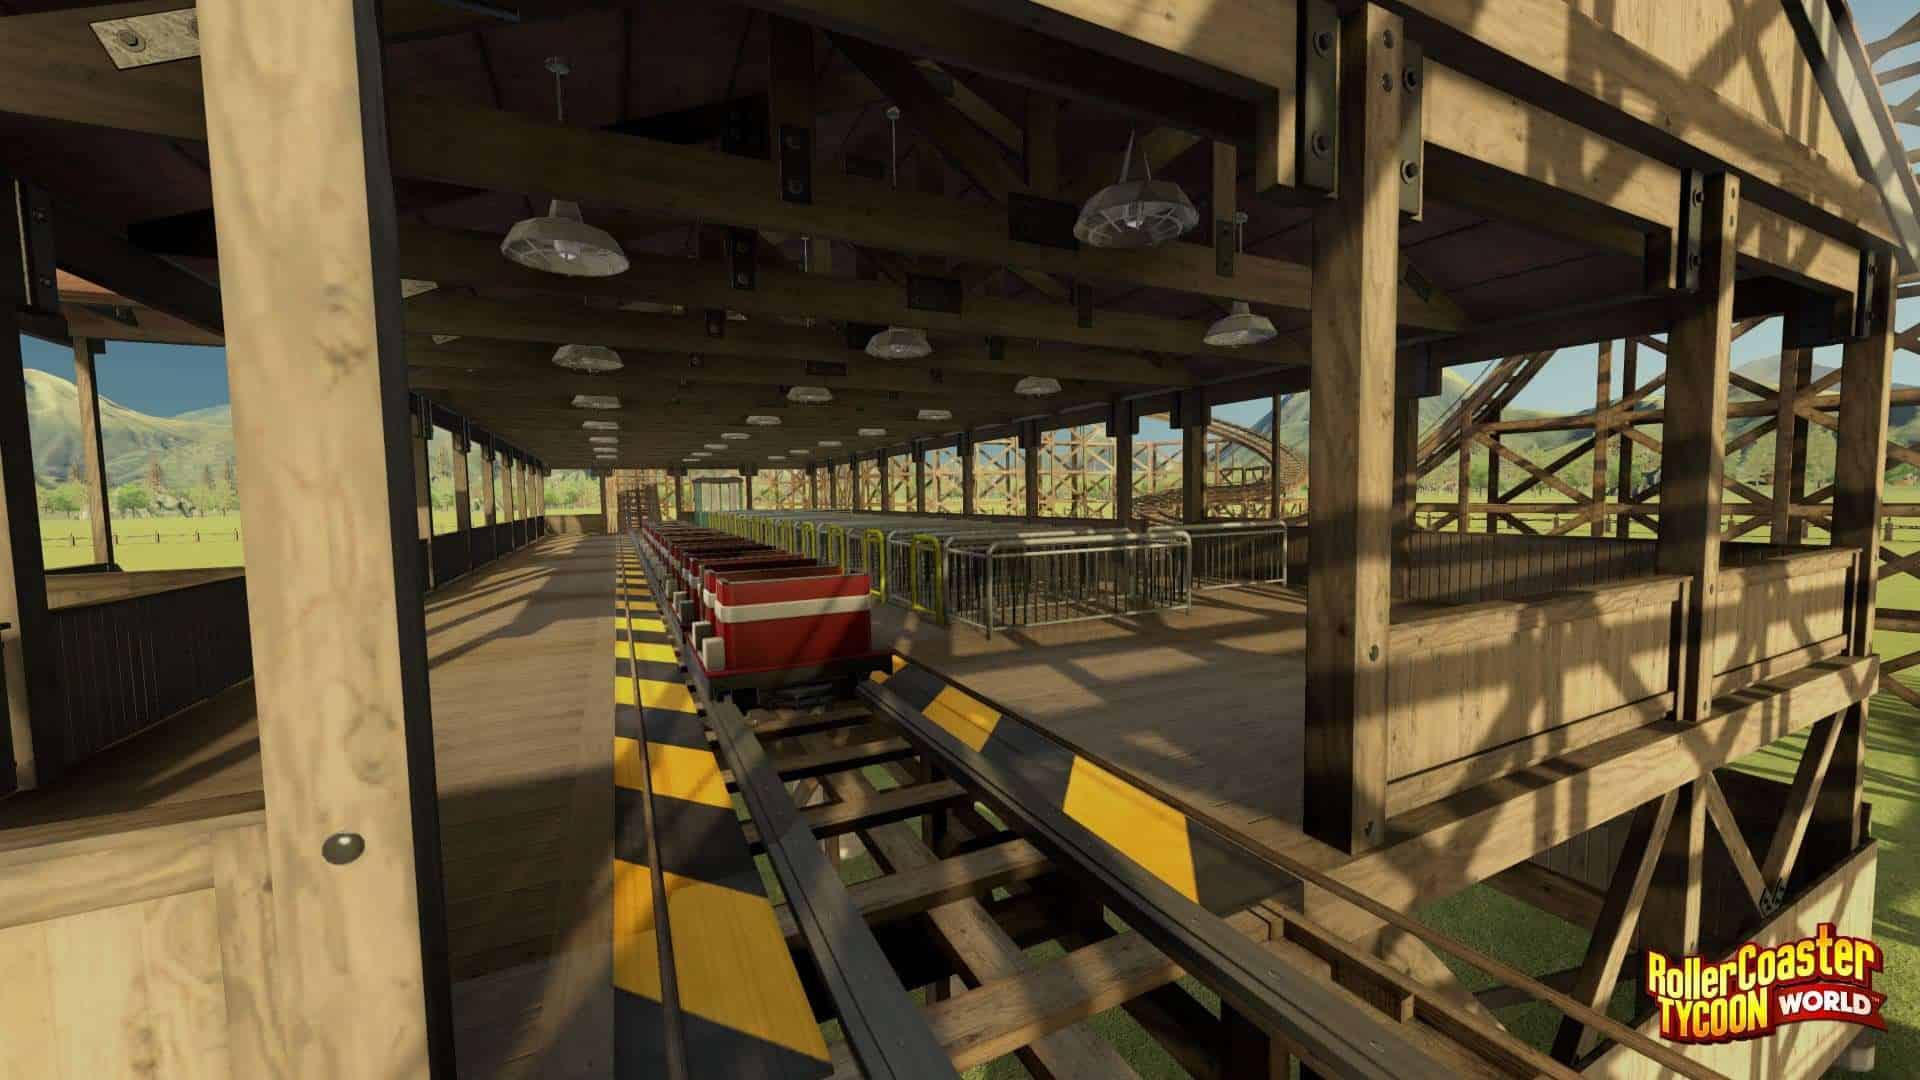 Roller Coaster Building Games Steam